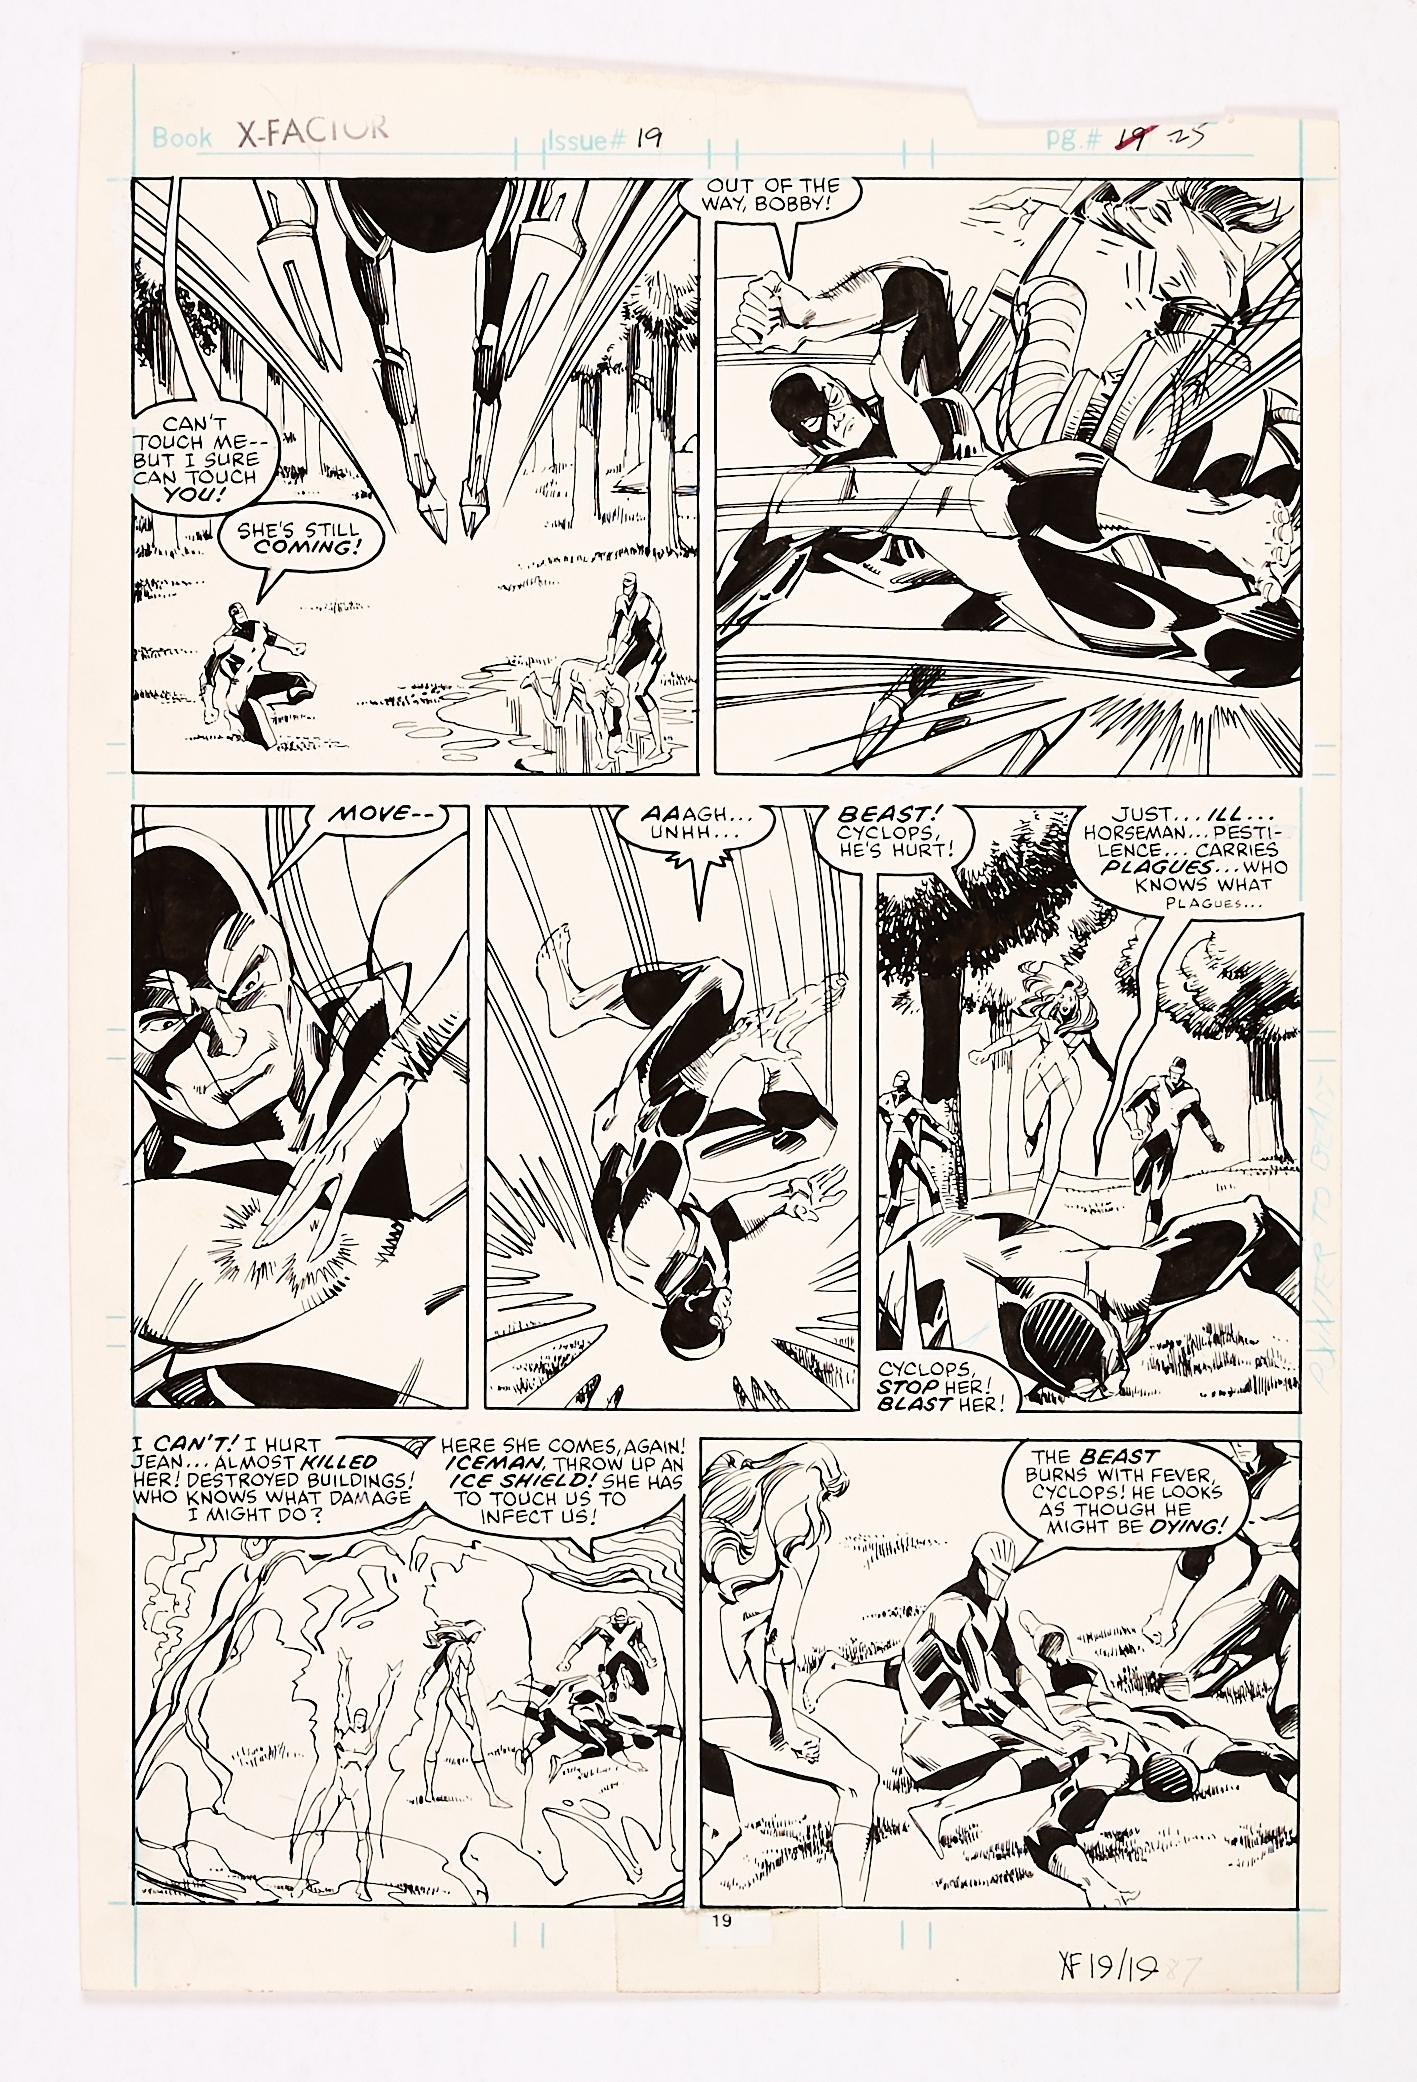 X-Factor #19 (1987) pg 25 original artwork by Walt Simonson. In the fight against the Apocalypse